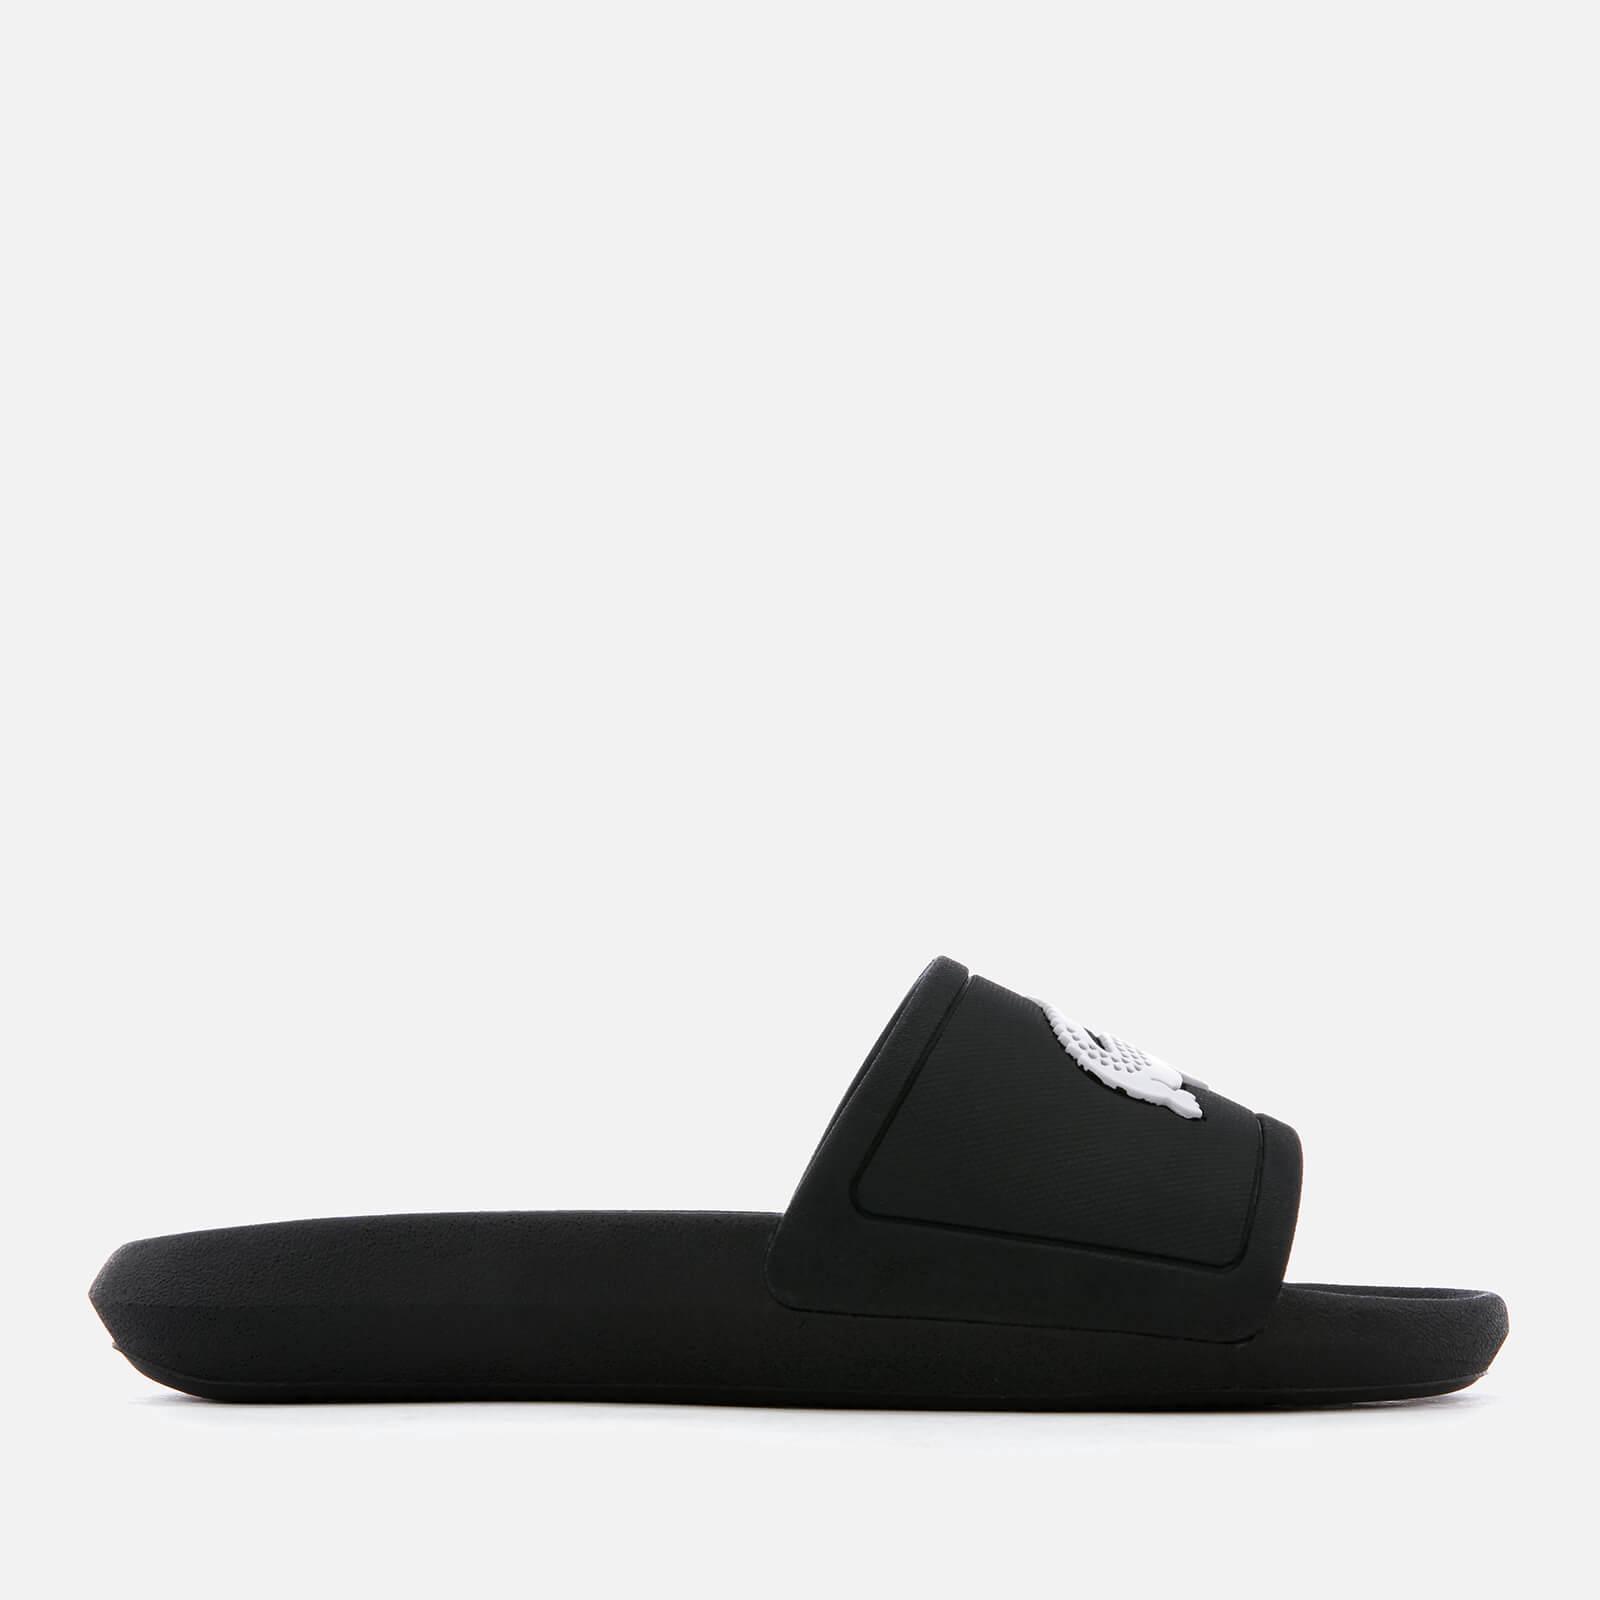 82ba8e96d Lacoste - Black Croco Slide 119 3 Sandals - Lyst. View fullscreen